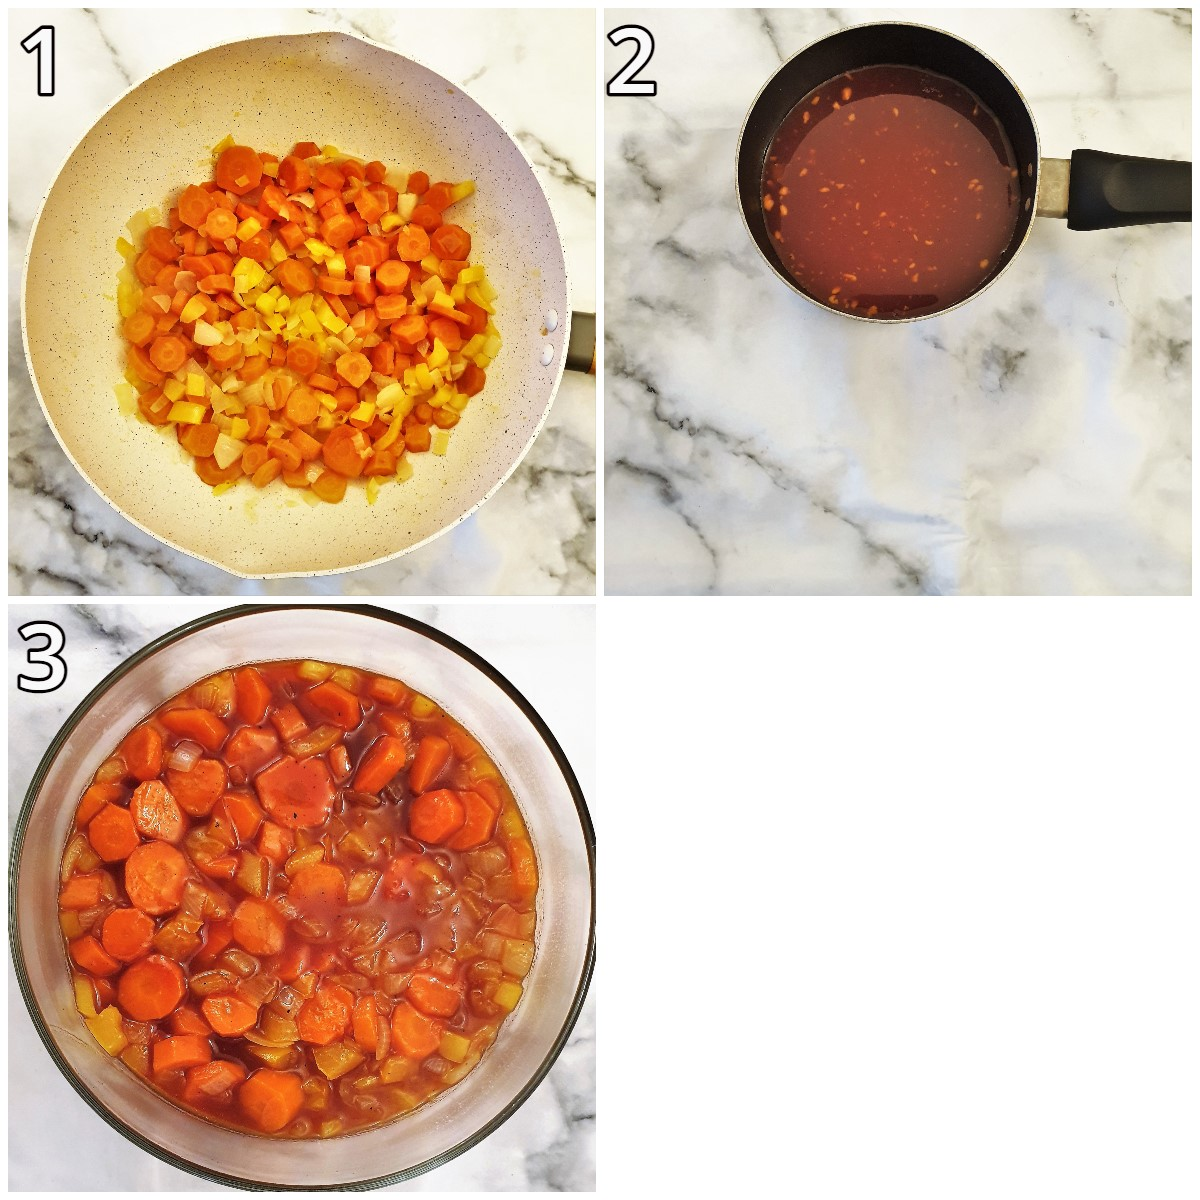 Steps for making copper penny salad.